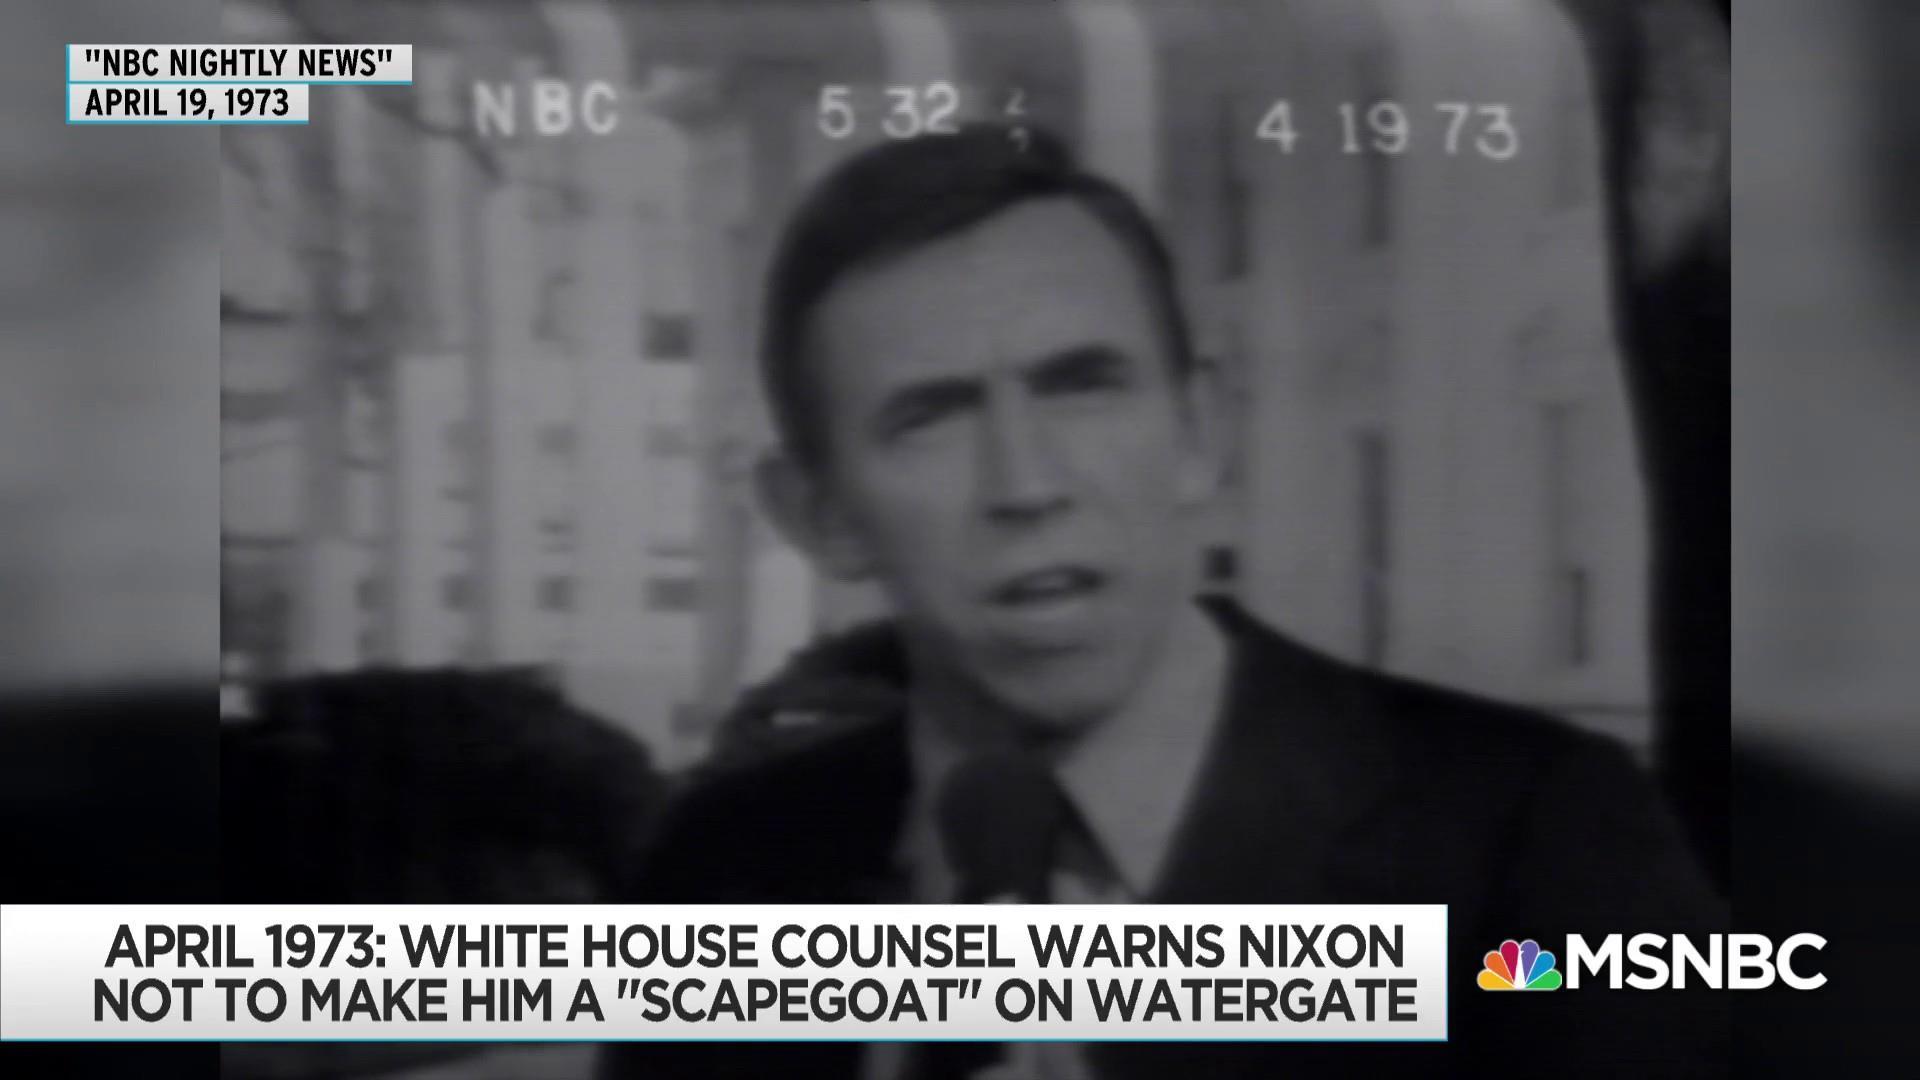 John Dean, key Watergate figure, gains new relevance in Trump era